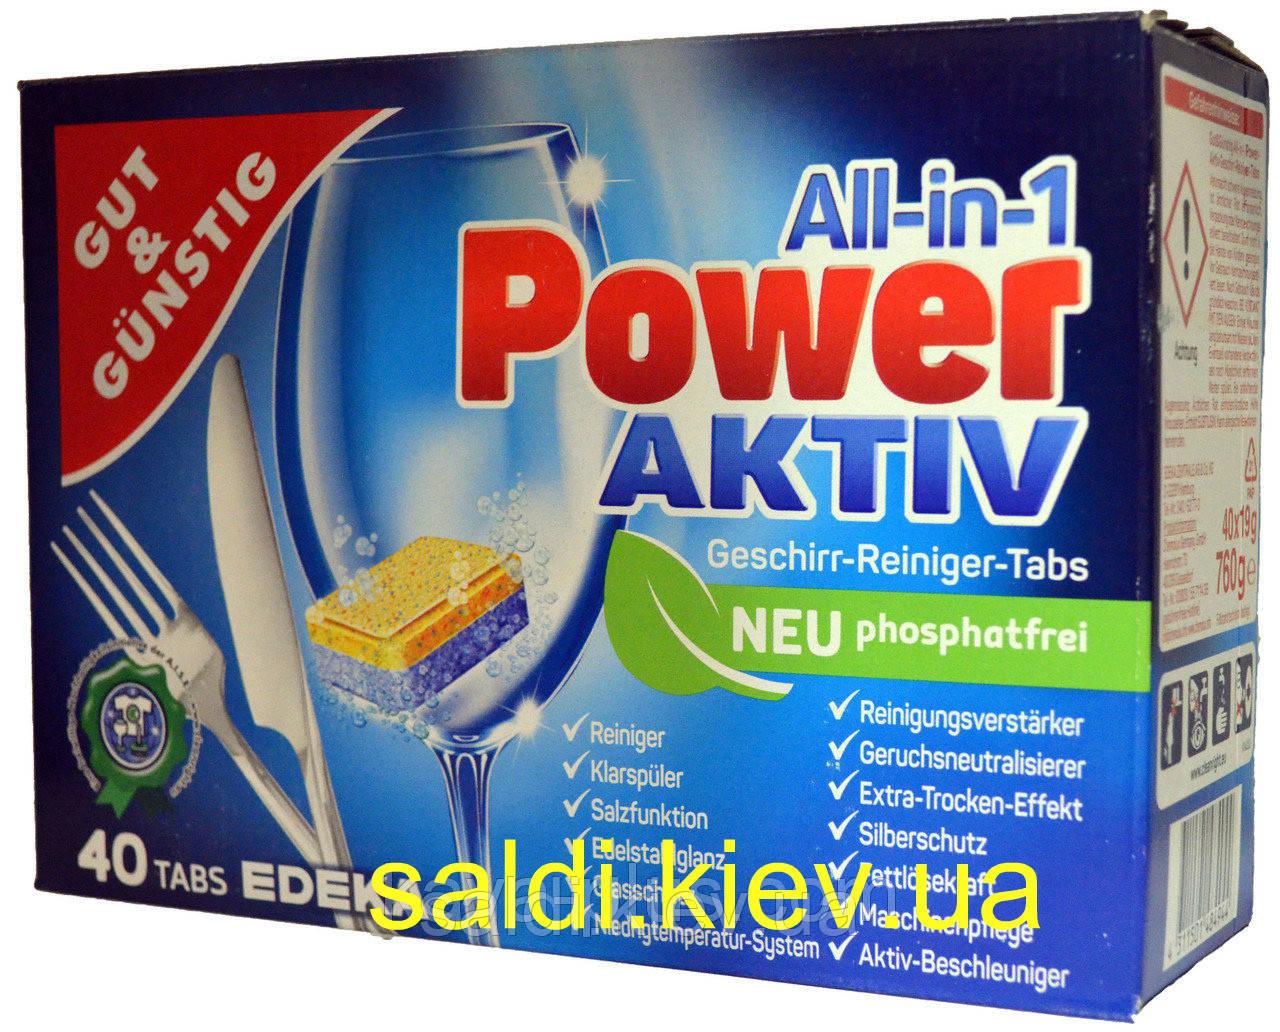 Таблетки для посудомоечных машин G&G POWER-AKTIV All-in-1 (40шт) Киев